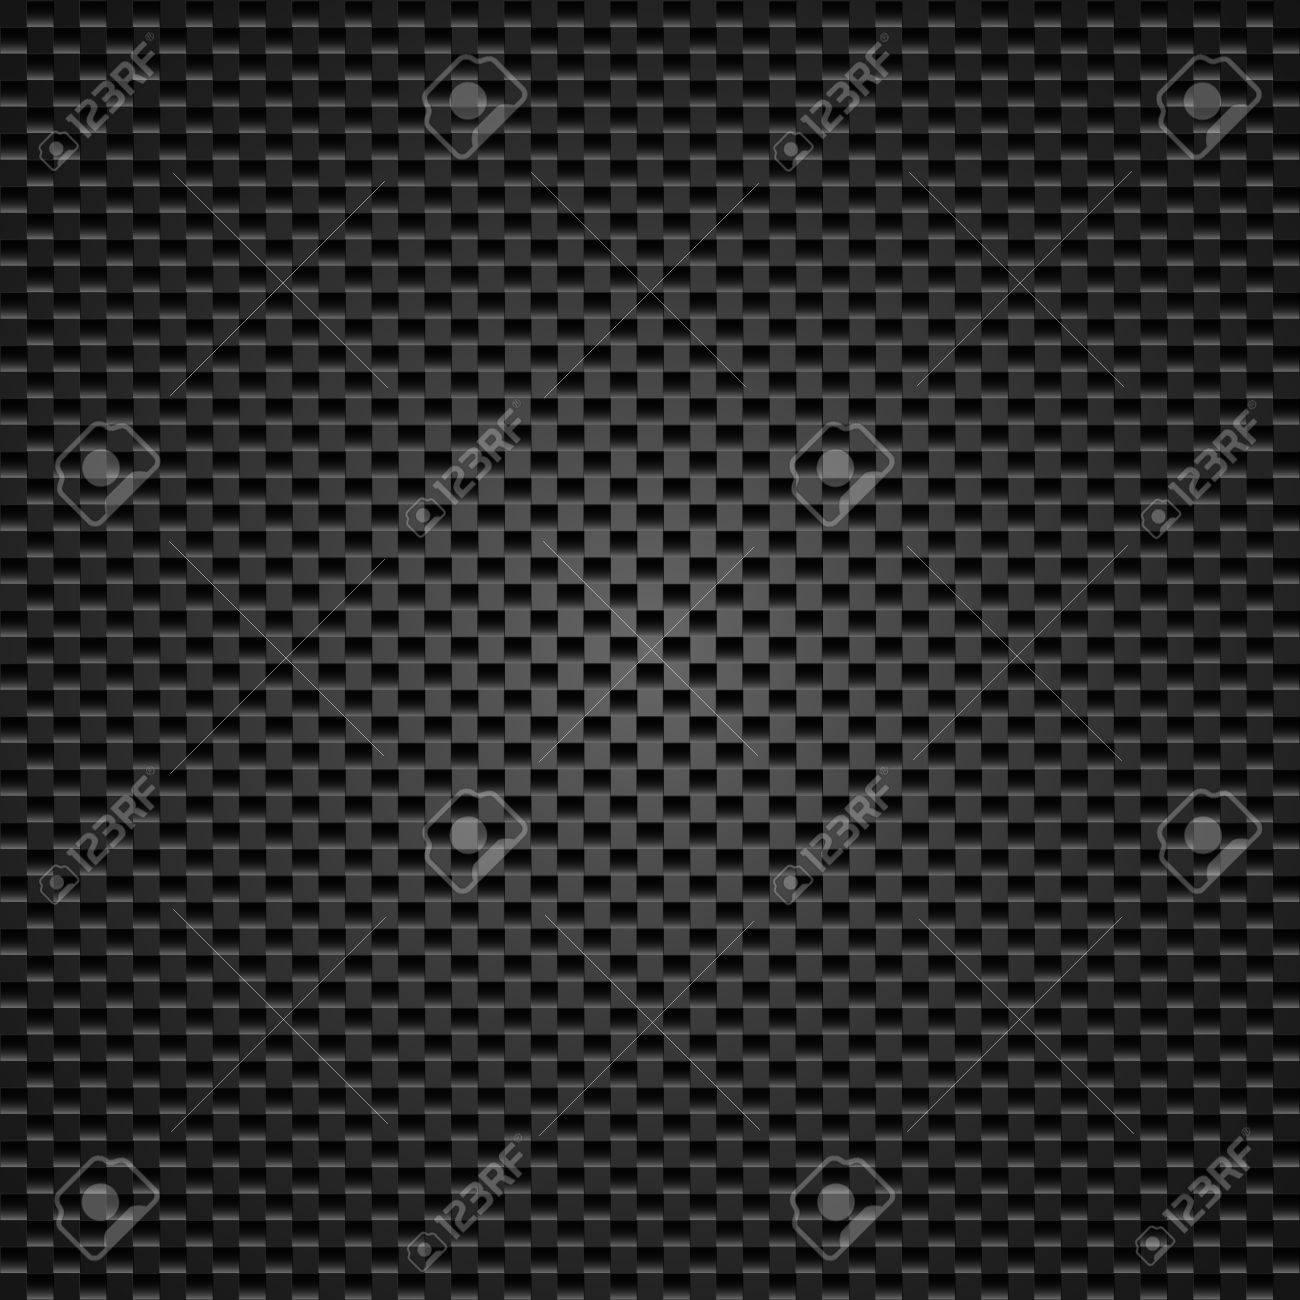 Carbon background of squares illustration designer Stock Vector - 13858338